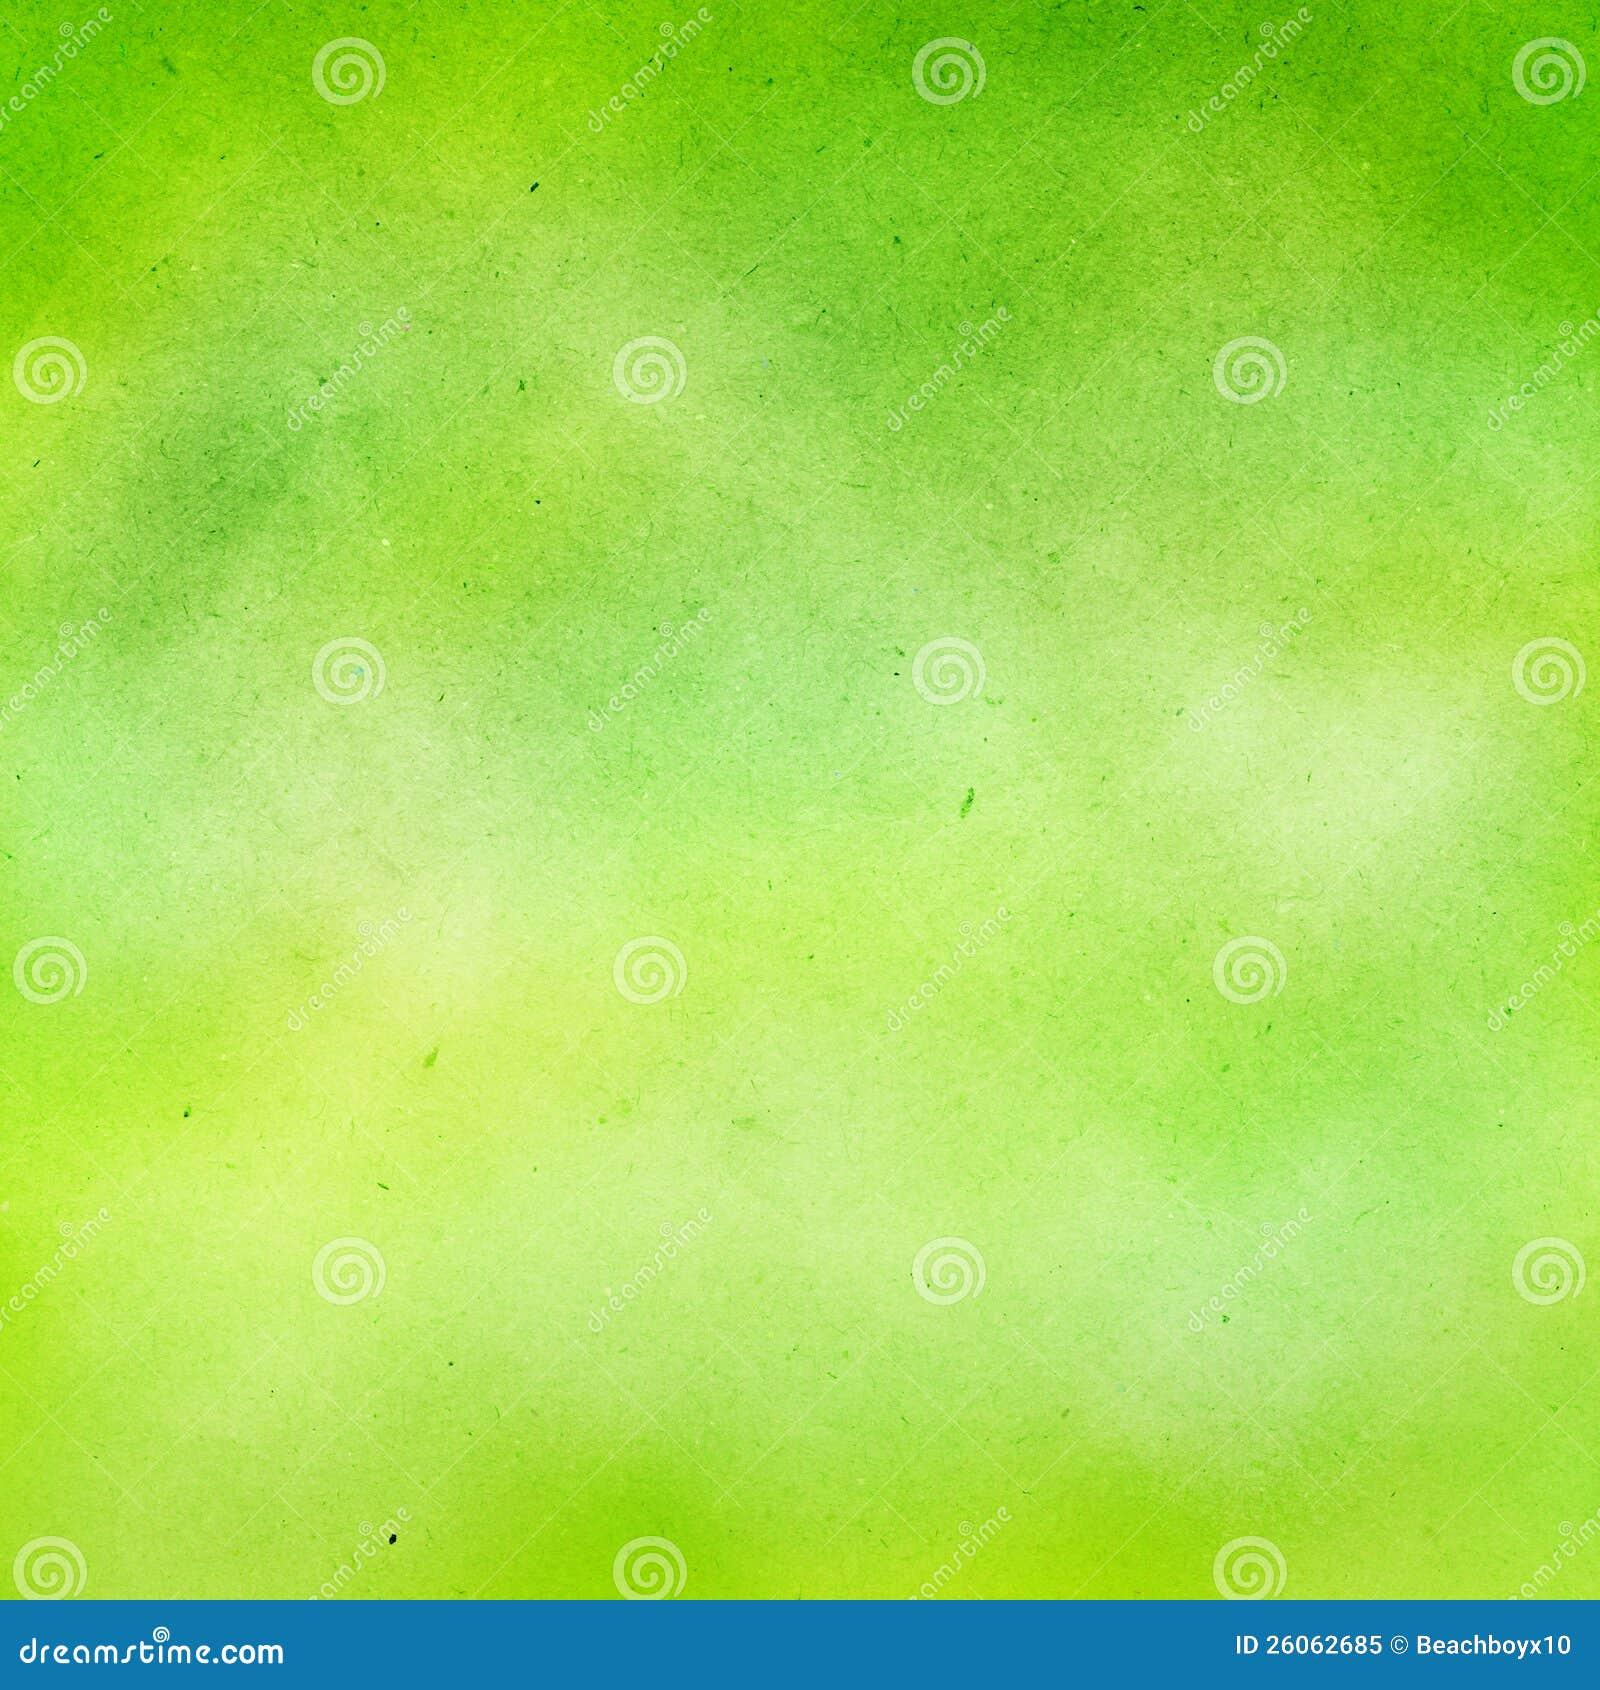 Paint texture paints background download photo green paint texture - Green Watercolor Background Royalty Free Stock Photo